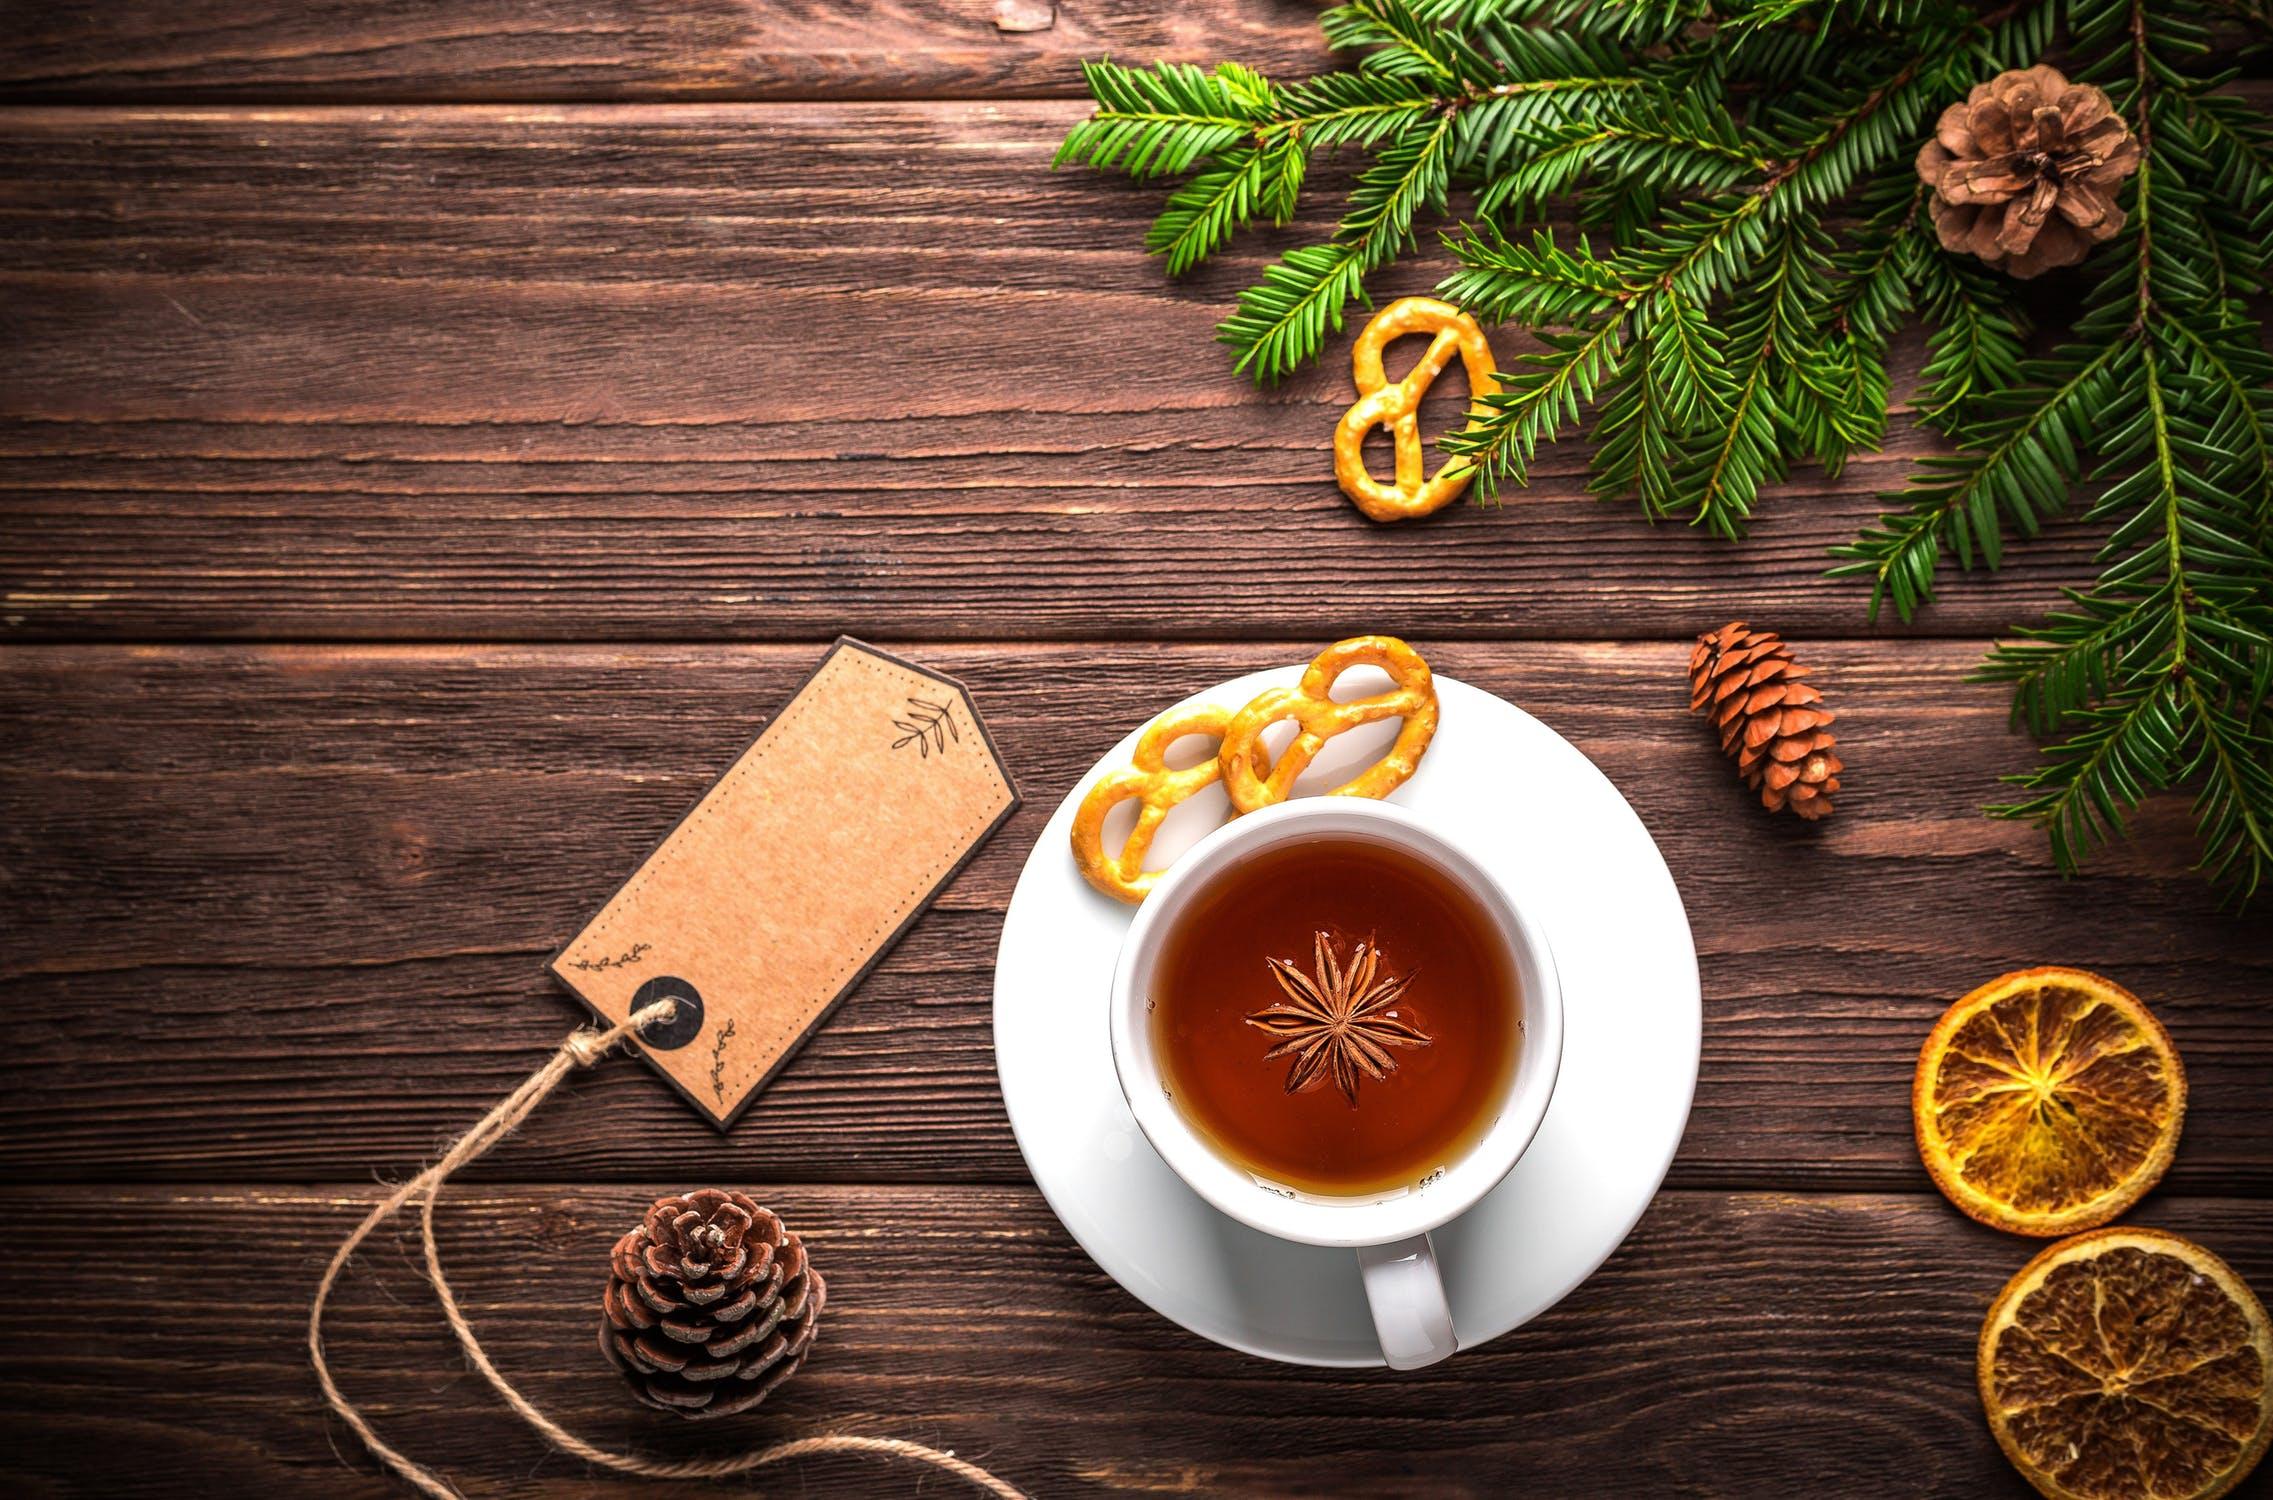 boissons de Noël